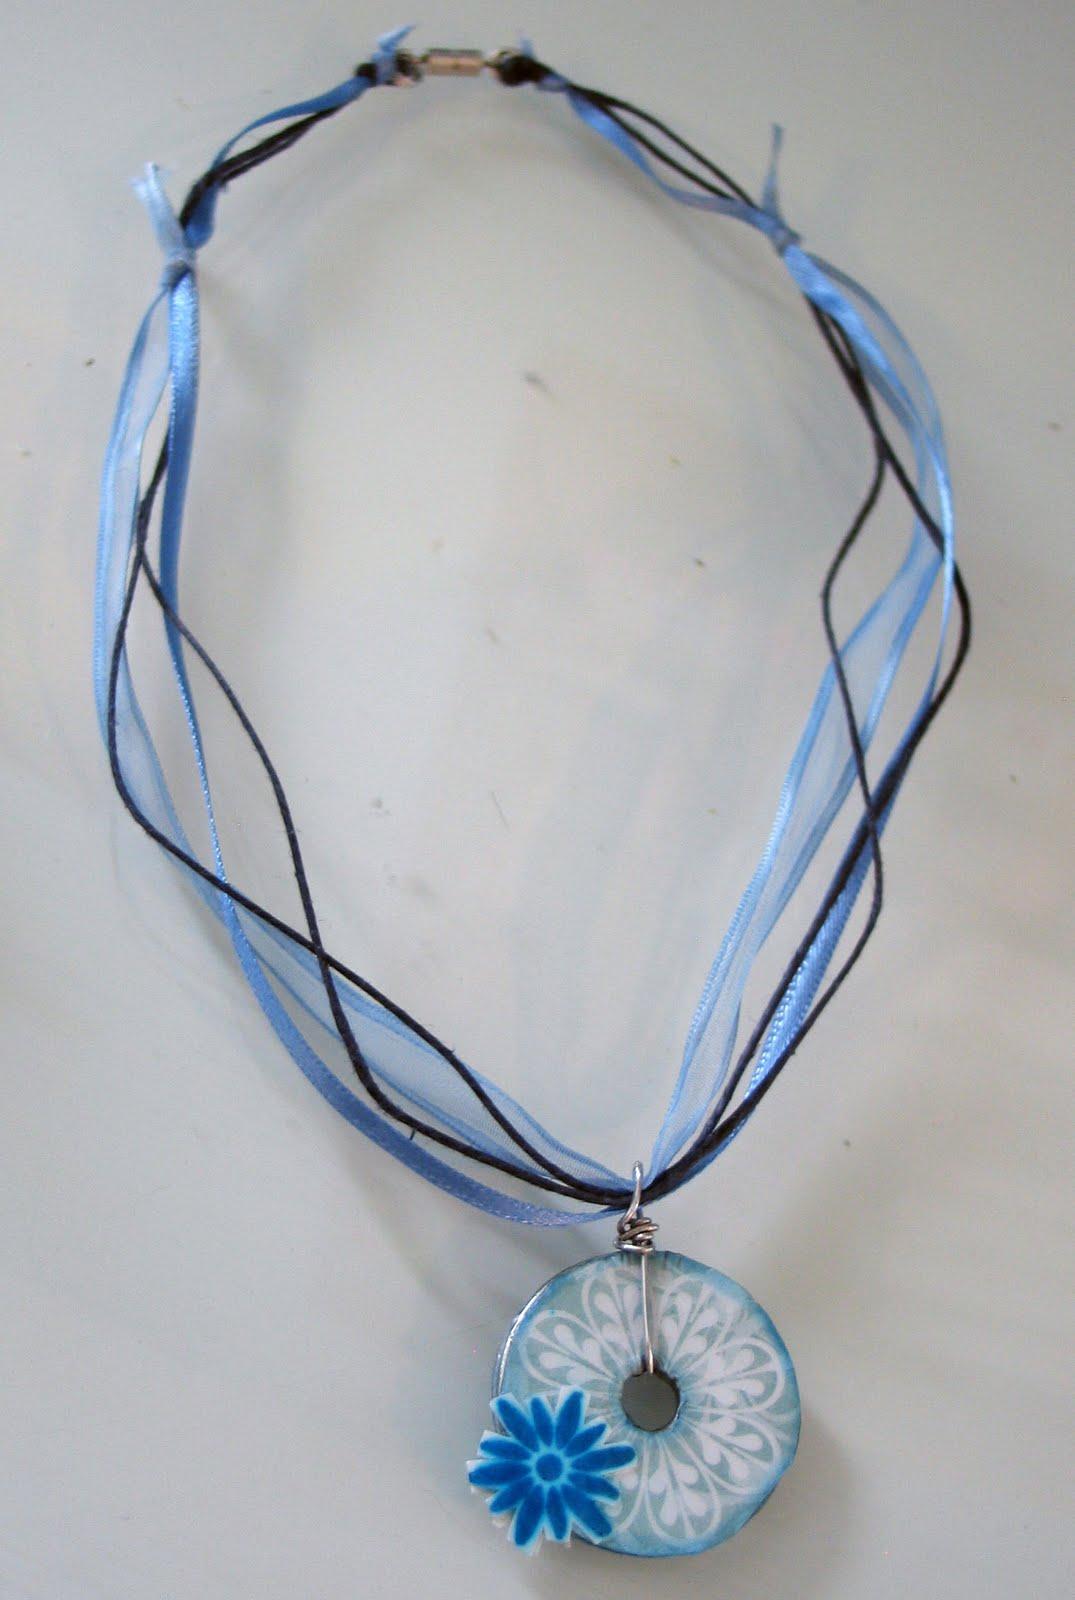 shealynn s faerie shoppe washer necklace